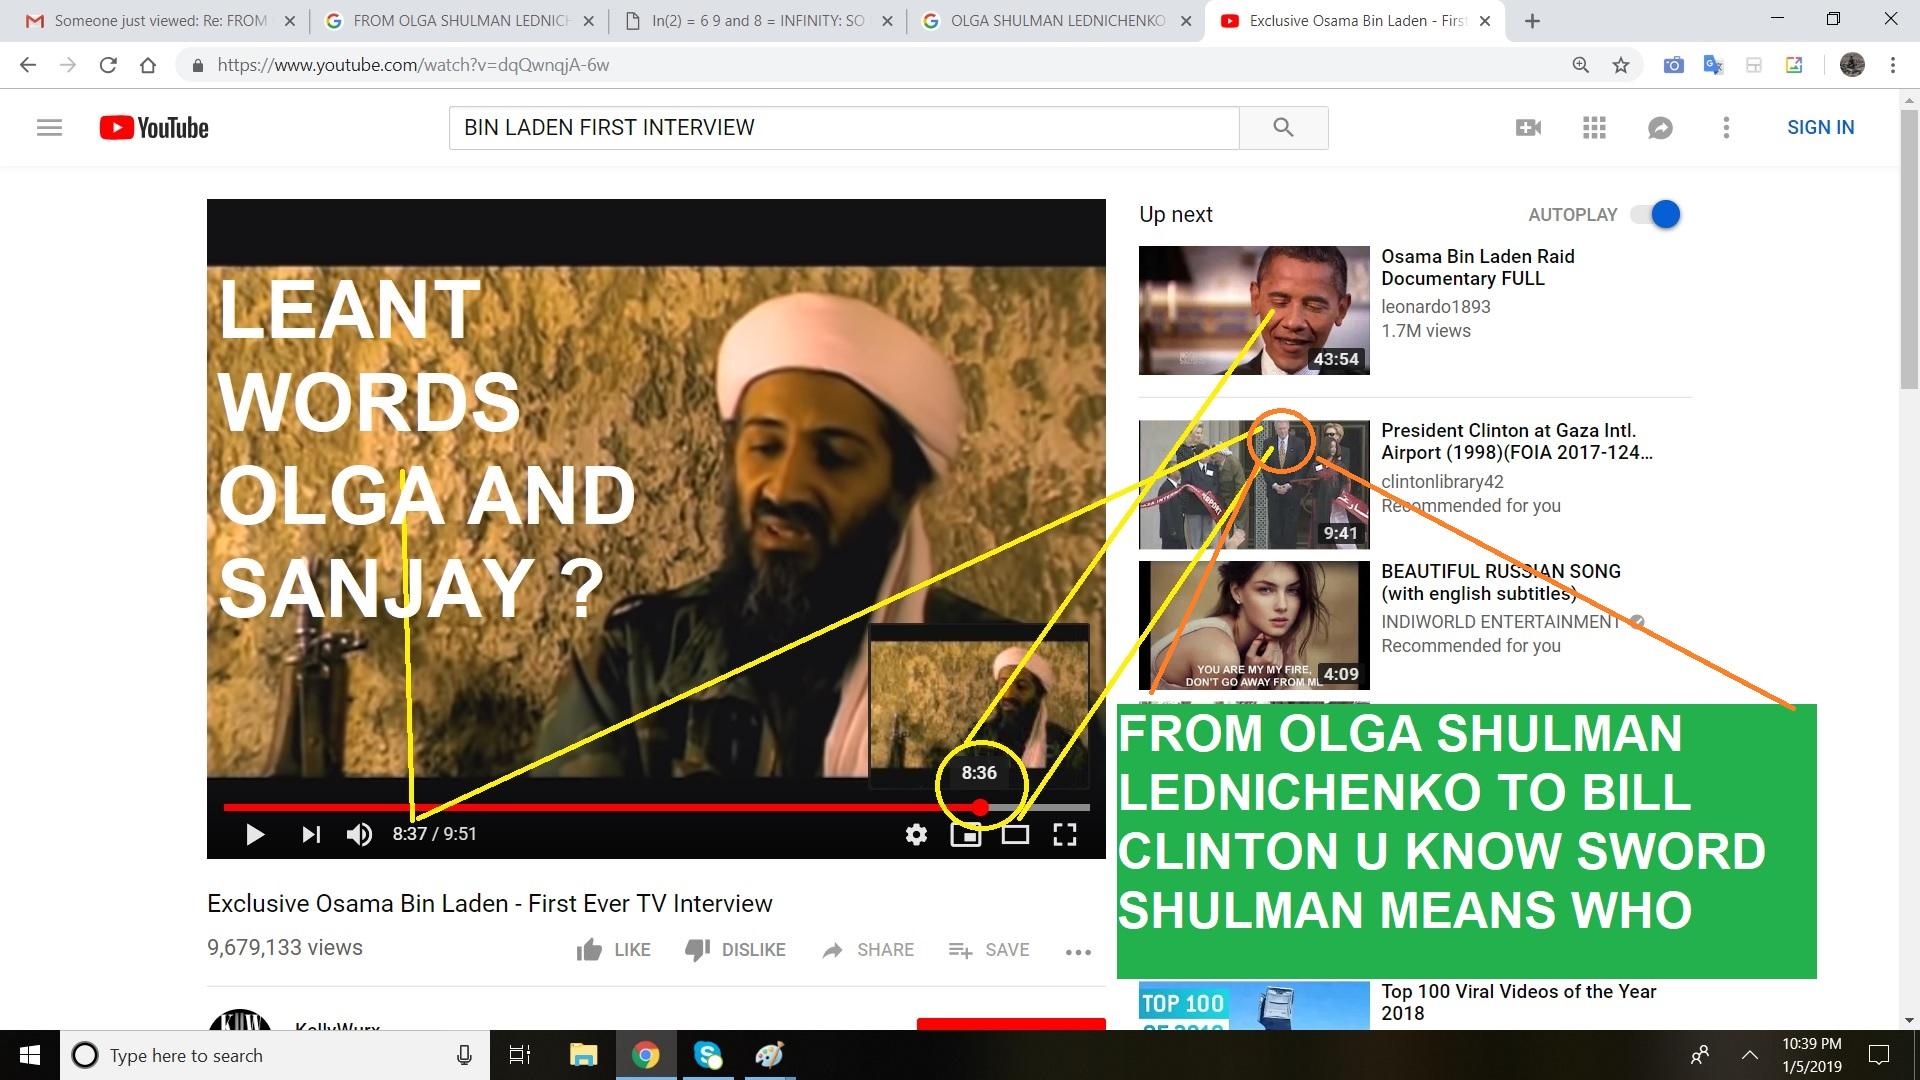 FROM OLGA SHULMAN LEDNICHENKO TO BILL CLINTON U KNOW SWORD SHULMAN MEANS WHO